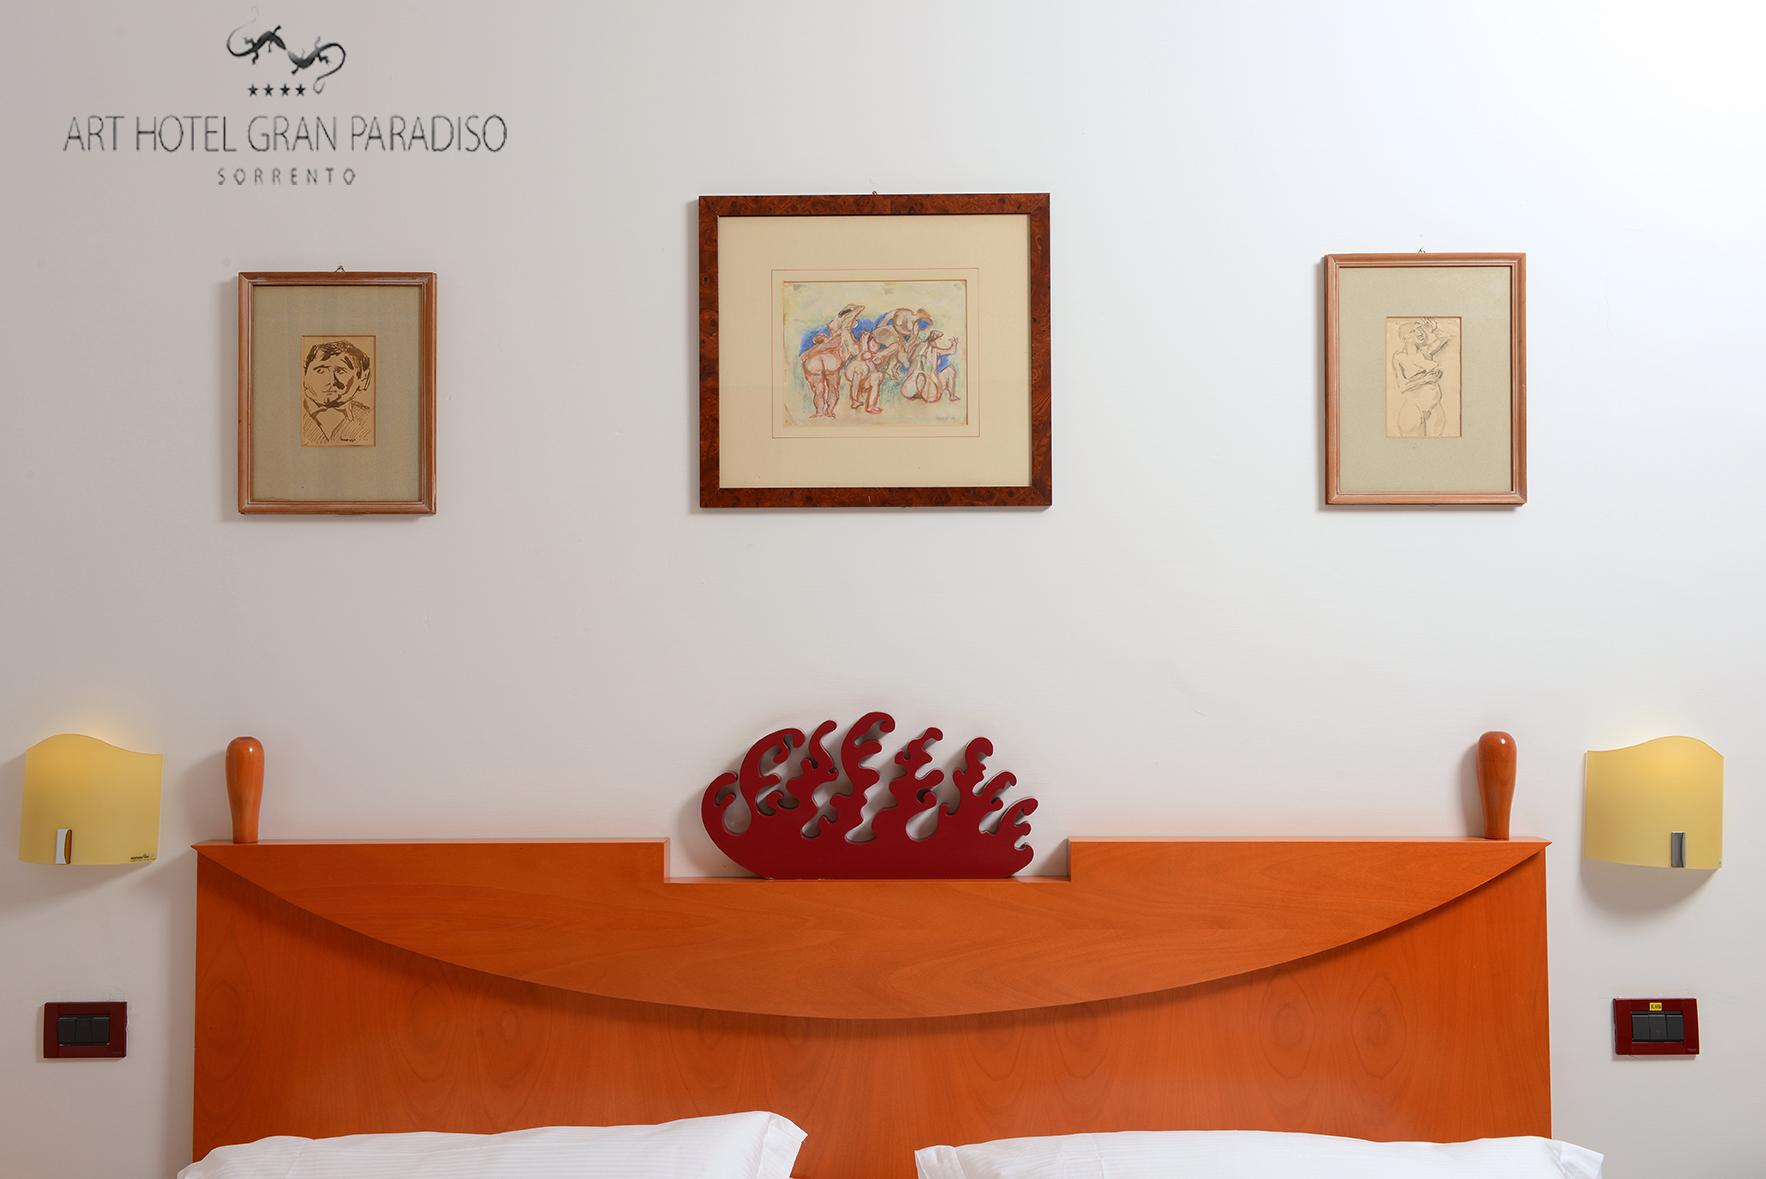 Art_Hotel_Gran_Paradiso_2013_315_Fausto_Pirandello_2.jpg